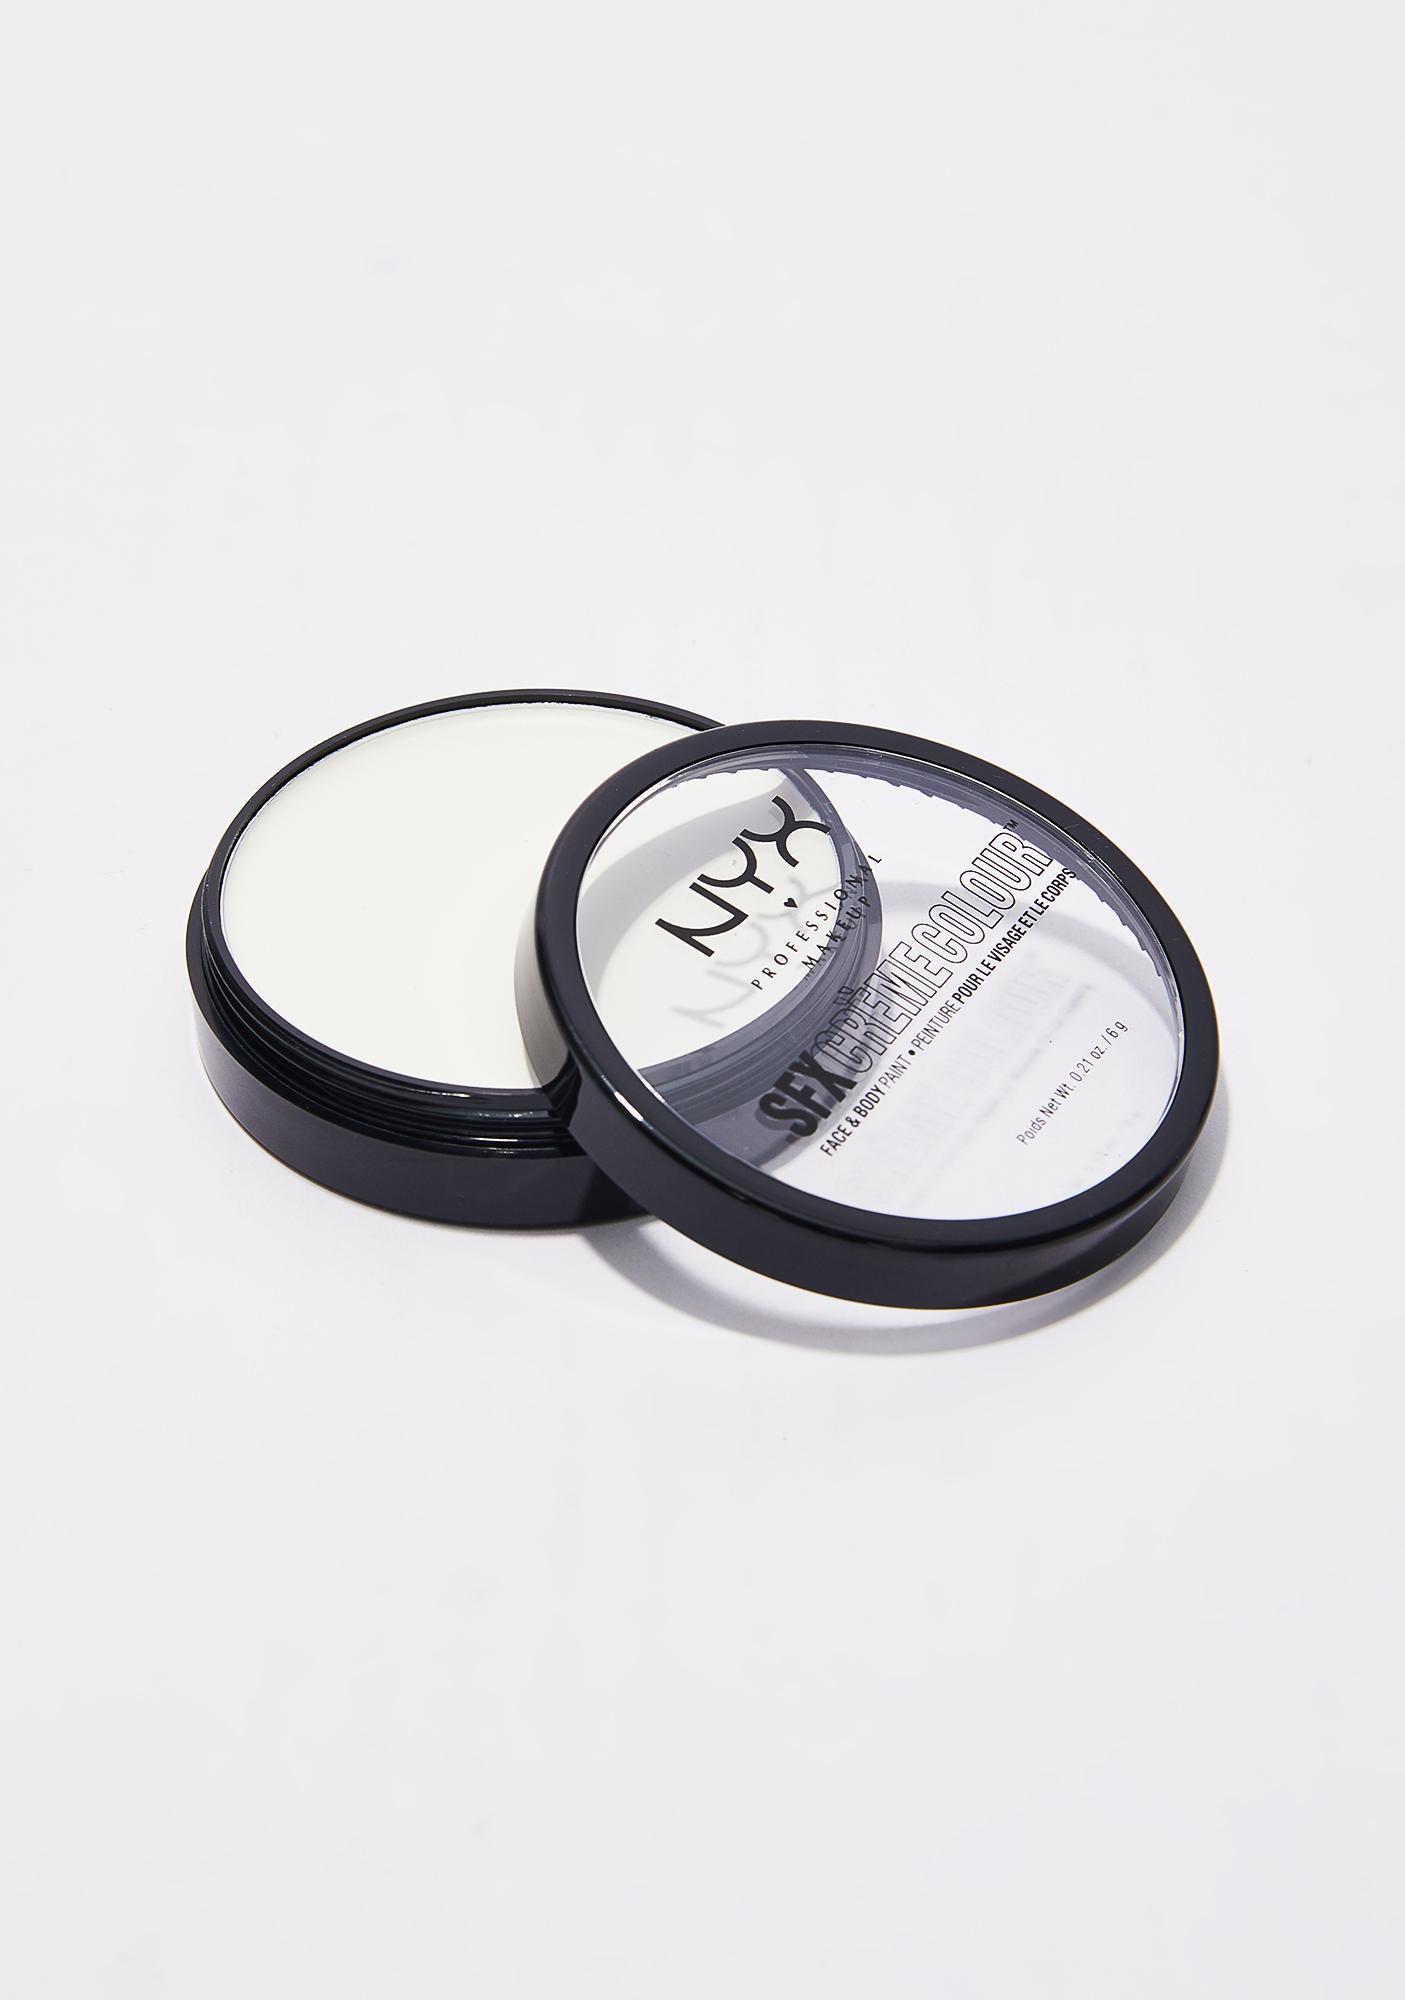 NYX White SFX Creme Colour Face & Body Paint